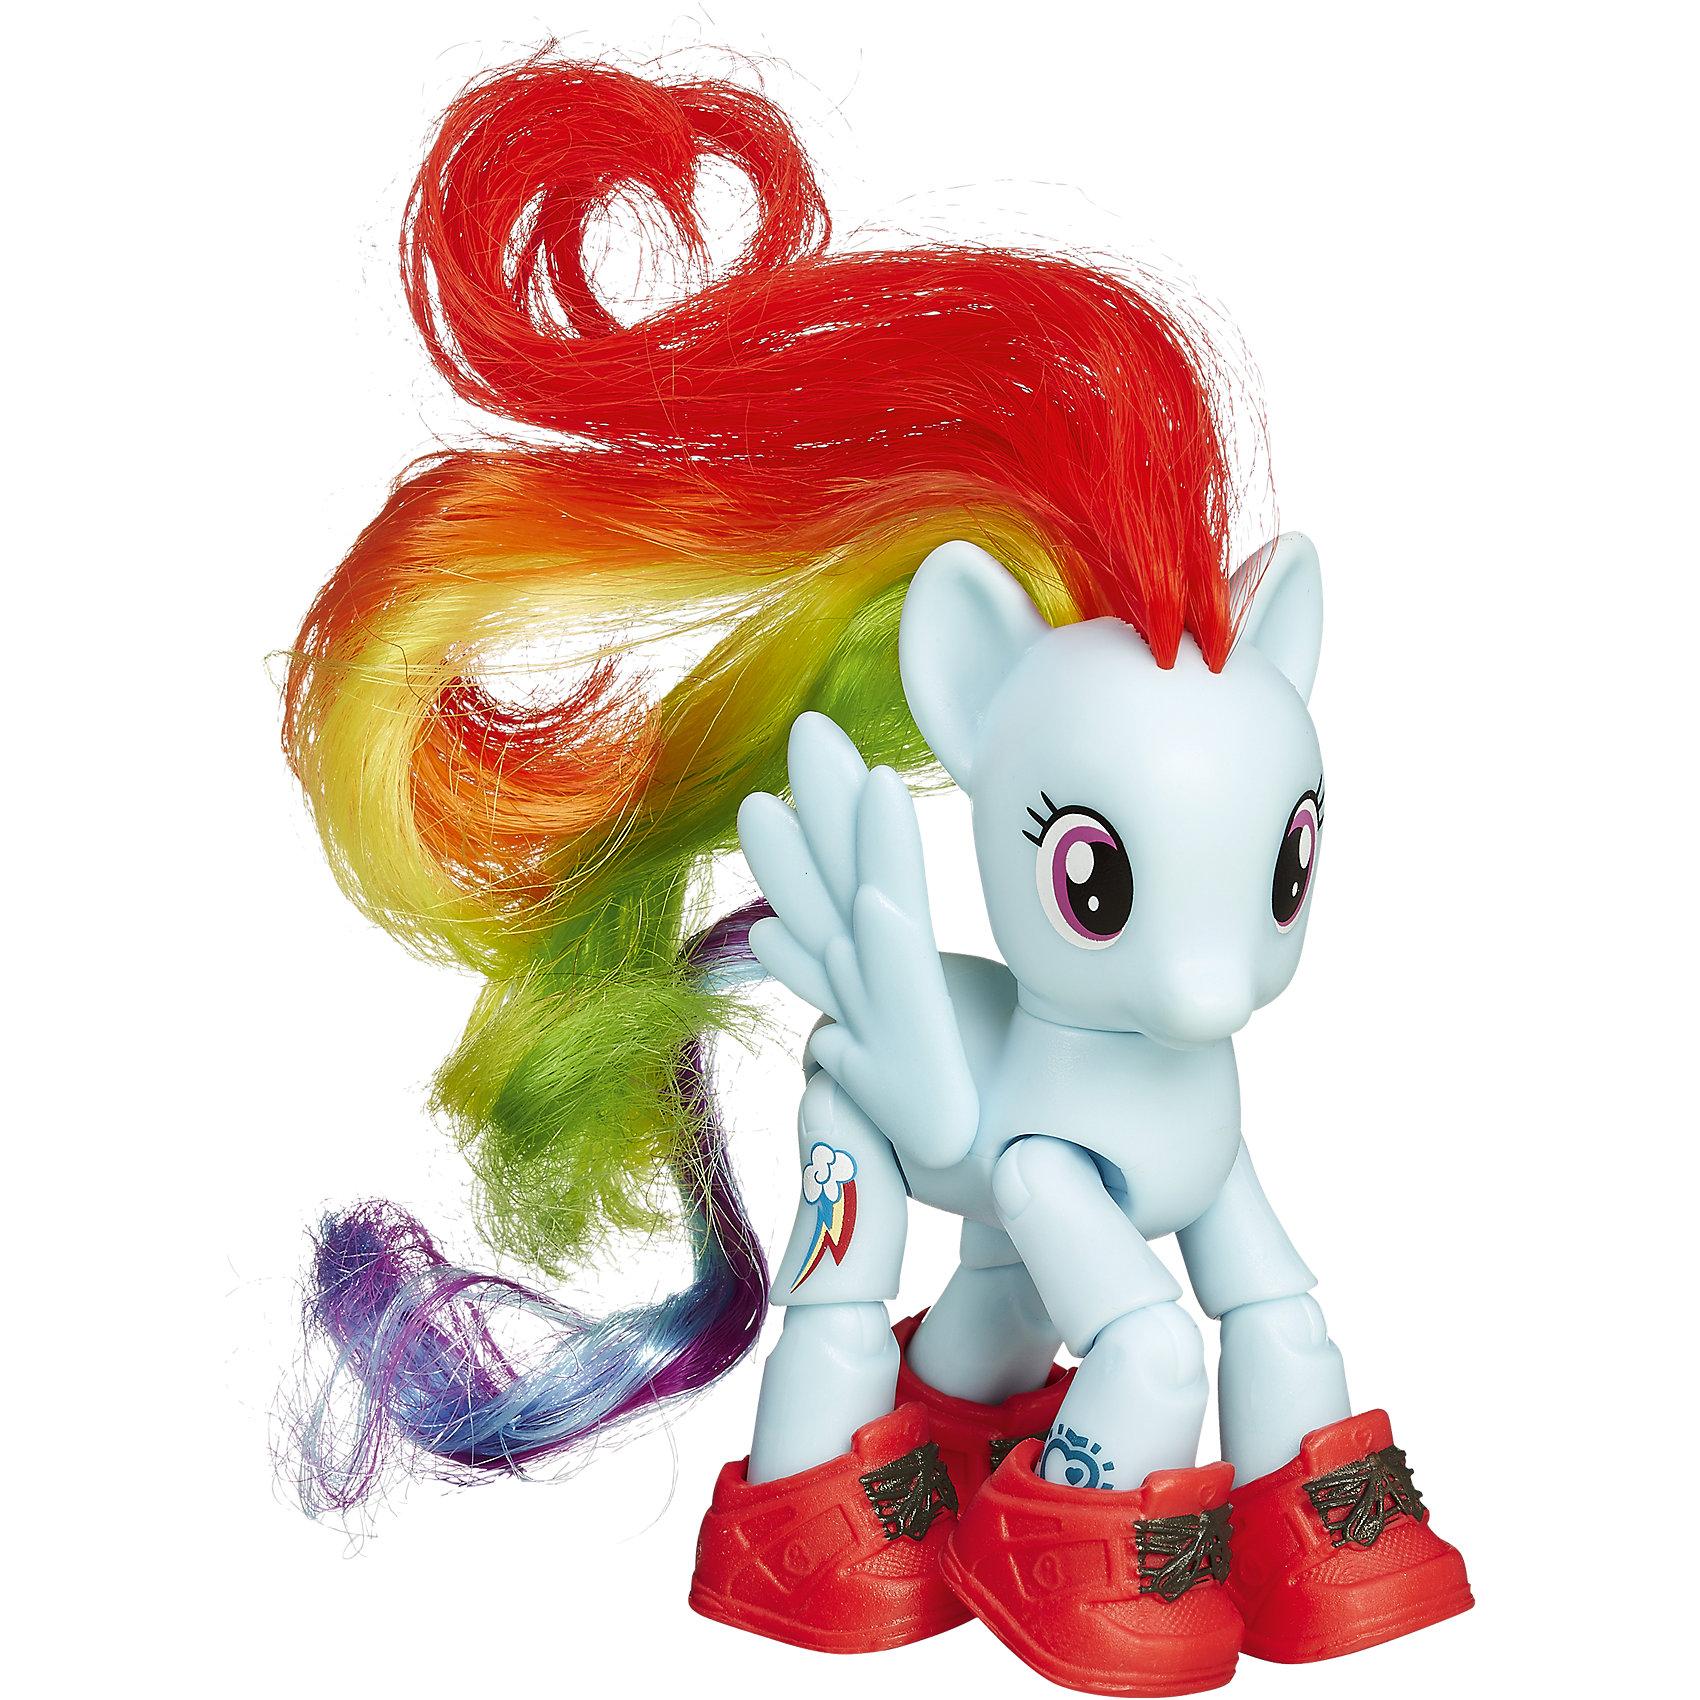 Hasbro Пони с артикуляцией, My little Pony hasbro my little pony b3598 май литл пони пони с артикуляцией в ассортименте